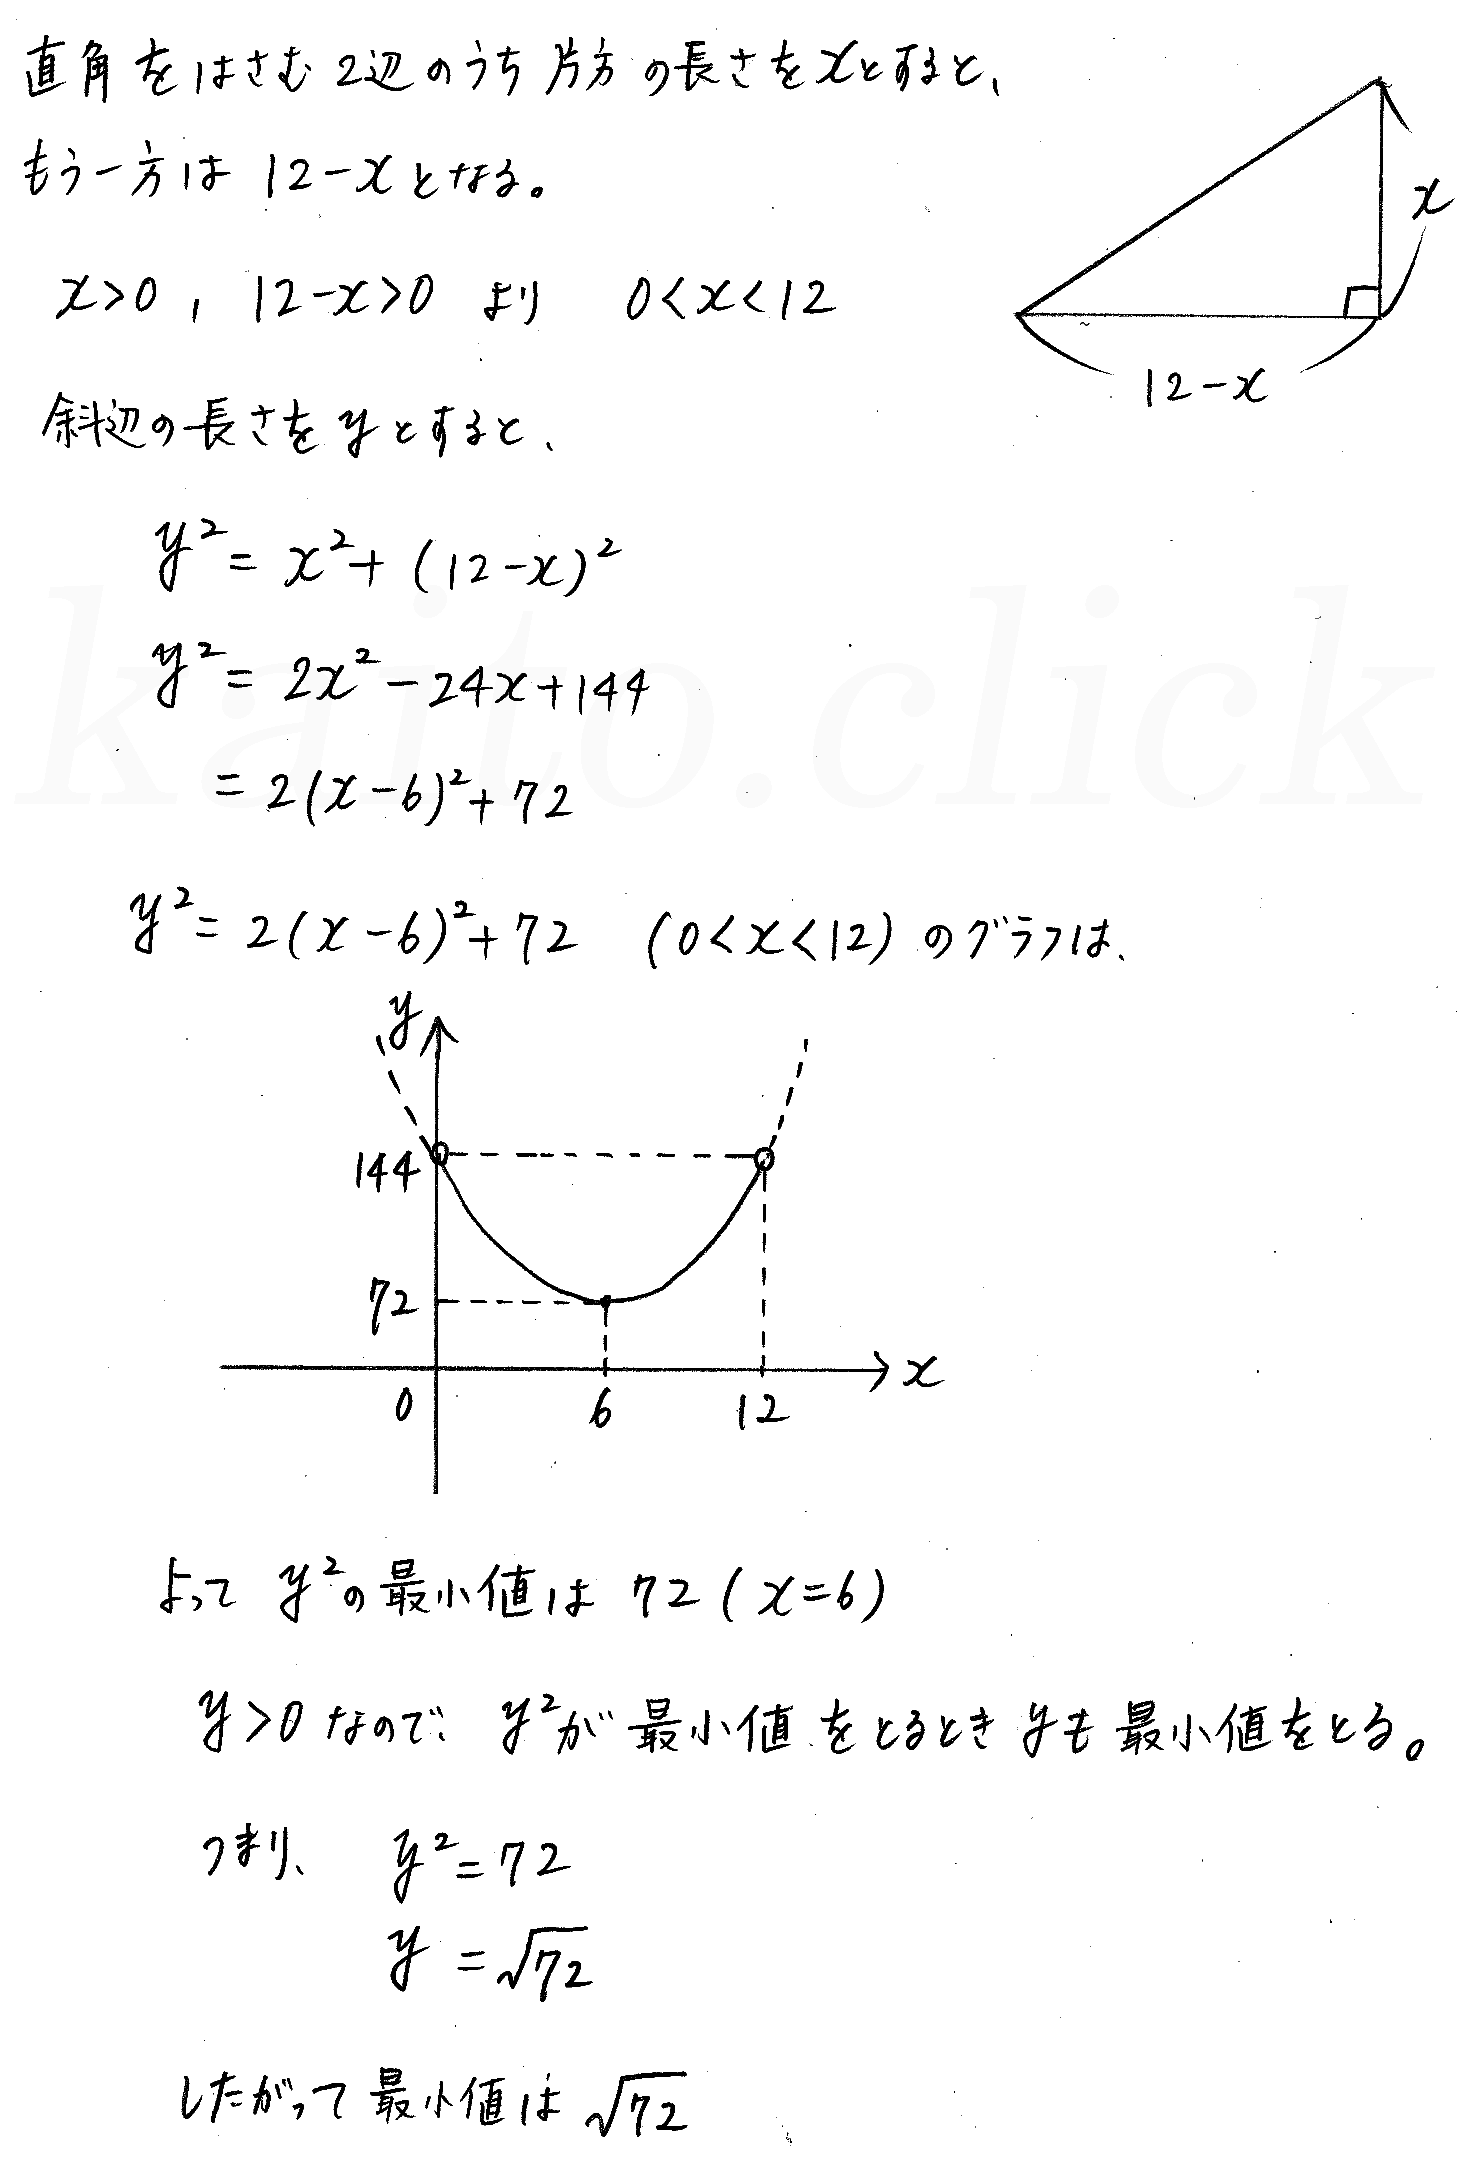 3TRIAL数学Ⅰ-150解答